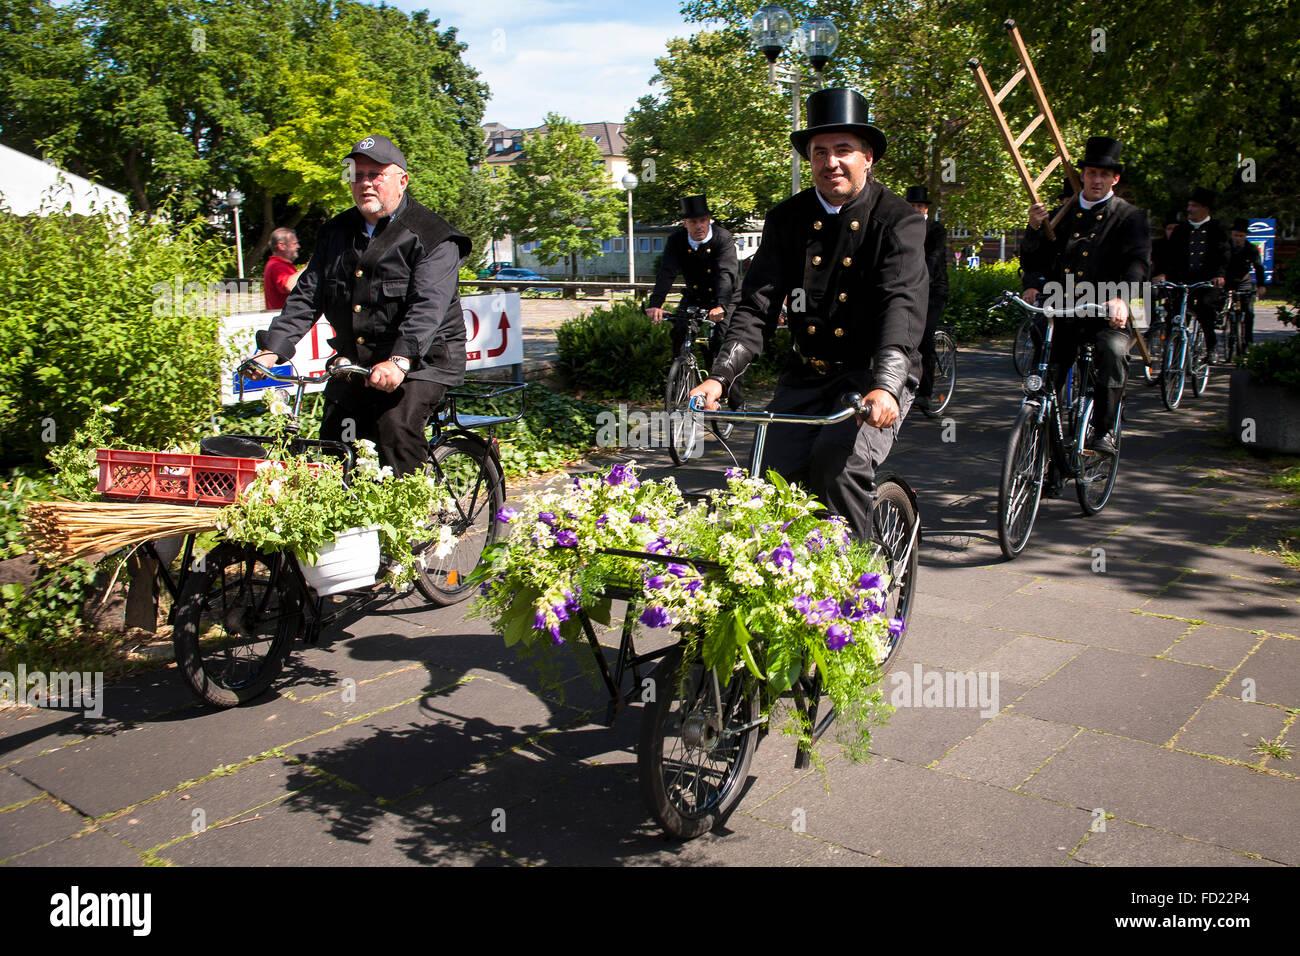 Europe, Germany, North Rhine-Westphalia, Bonn, chimney sweepers on bicycles. - Stock Image